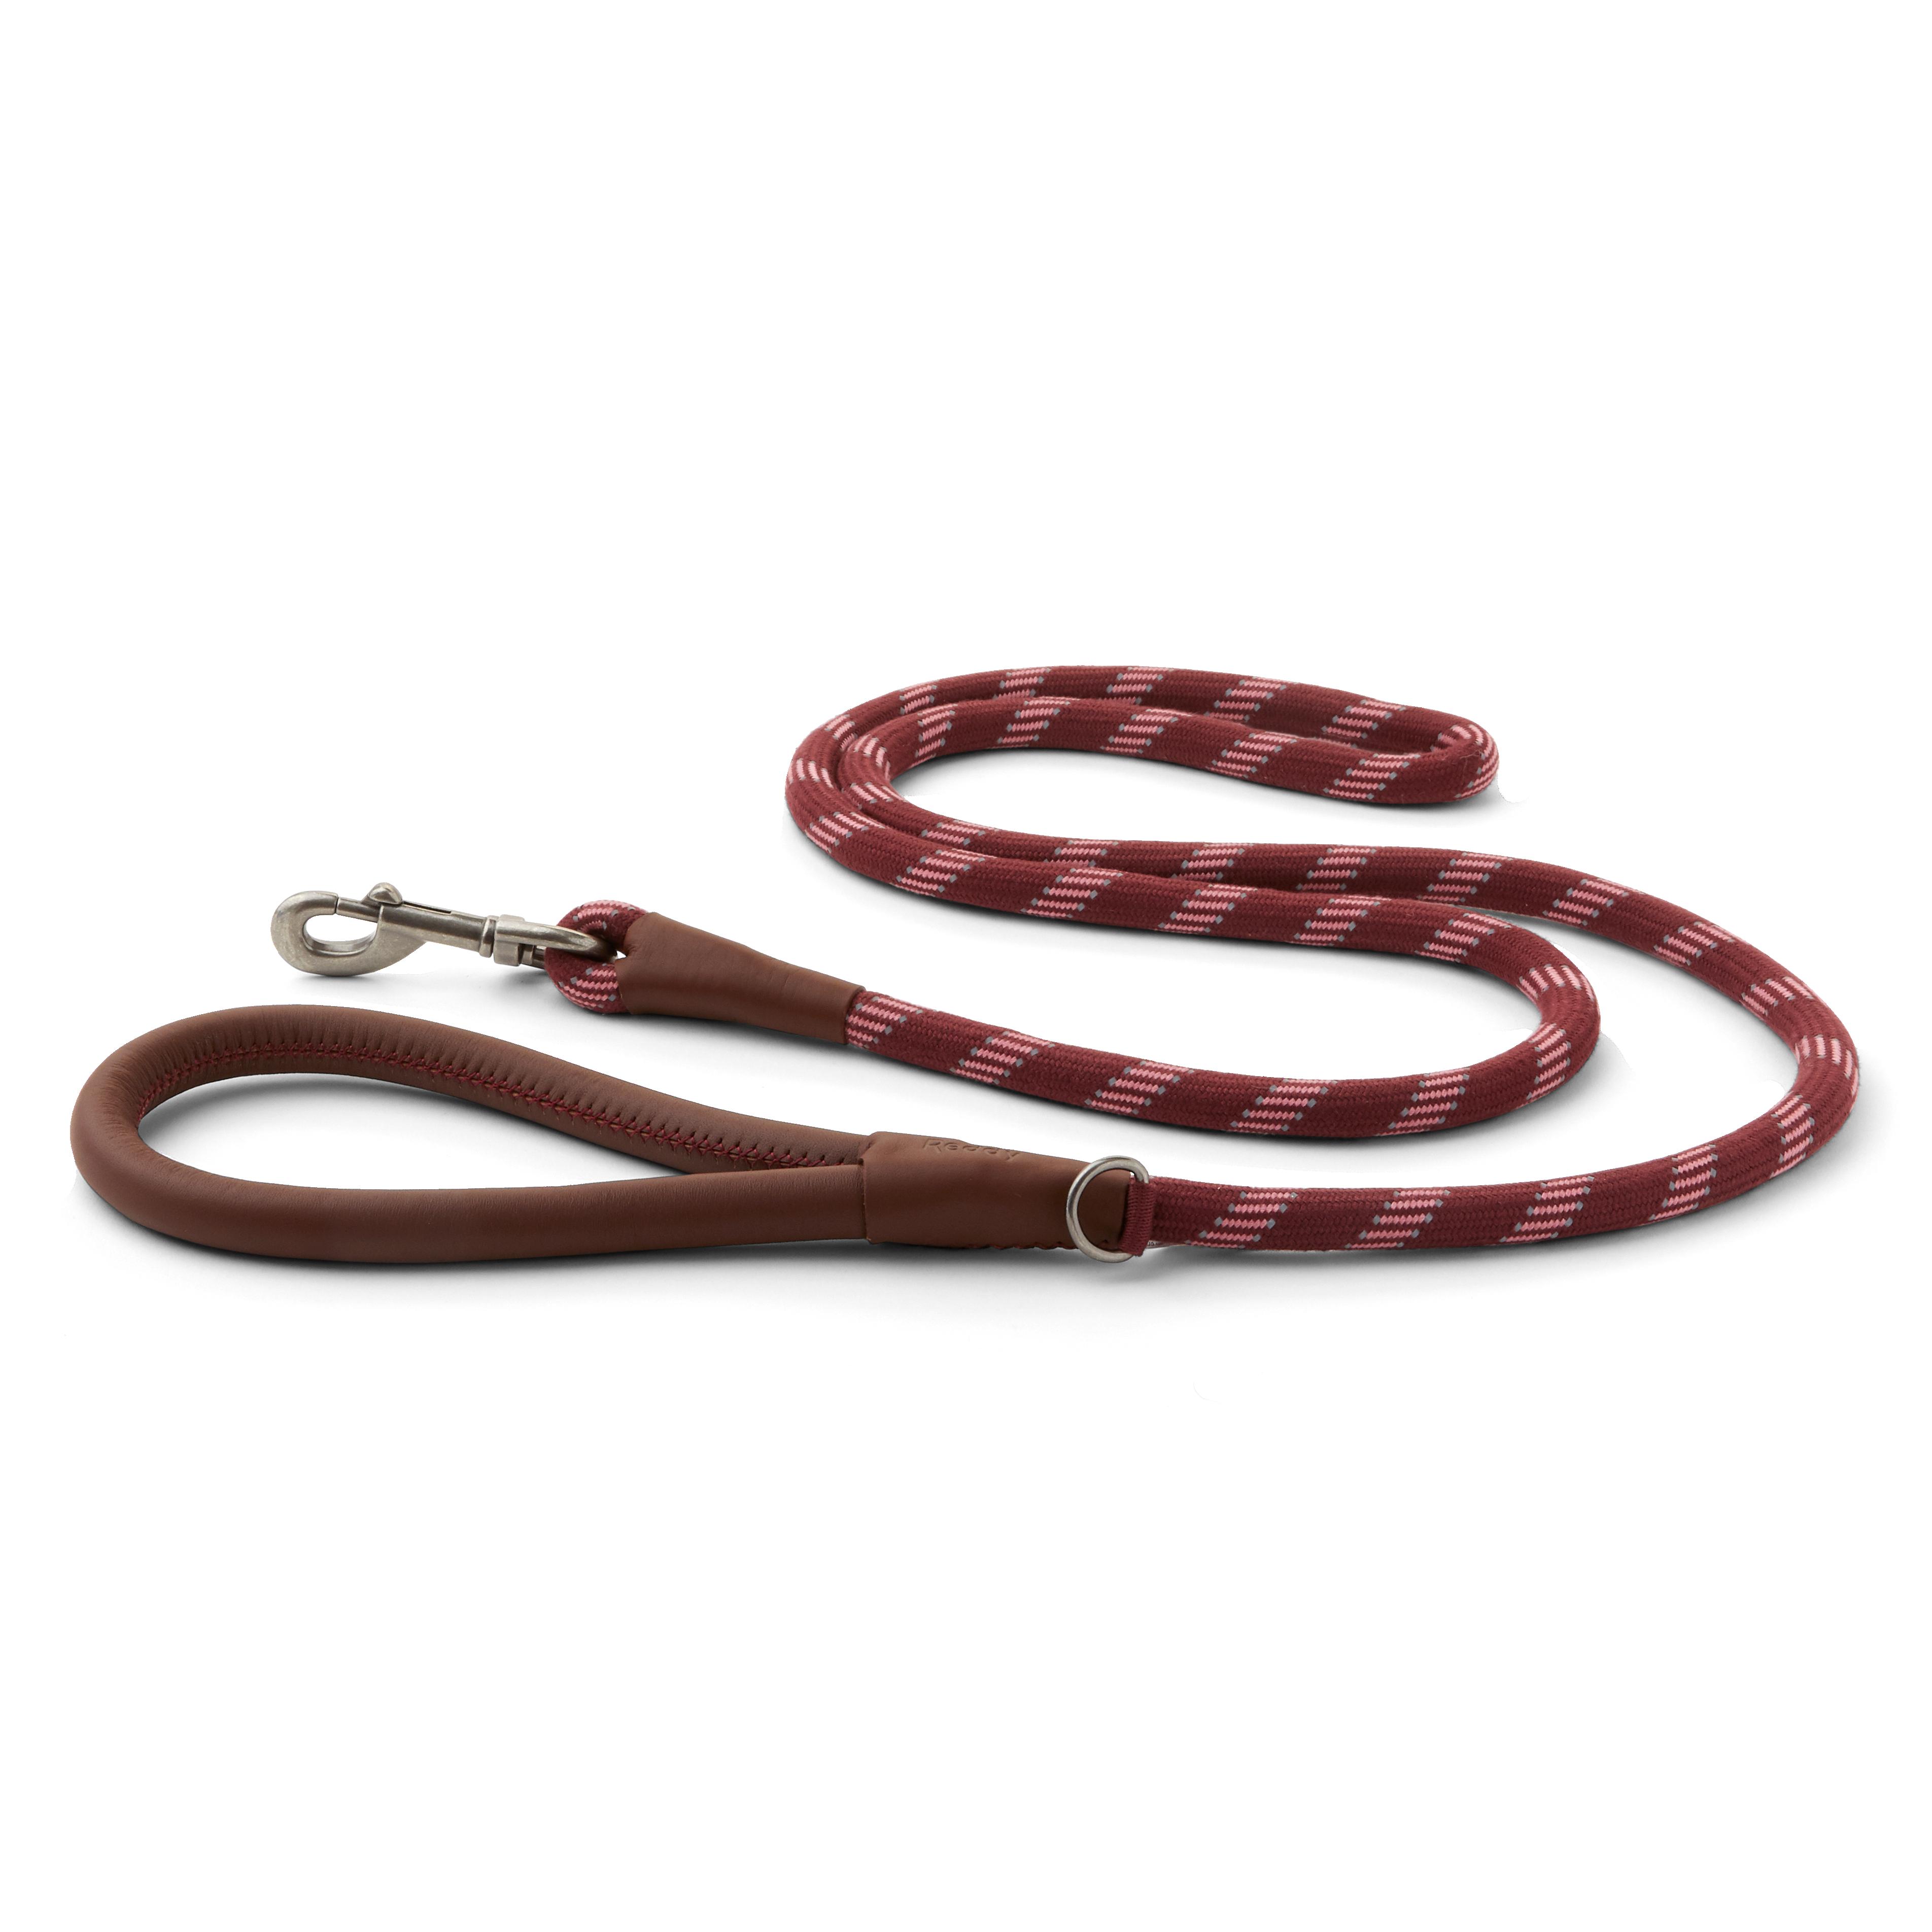 Reddy Burgundy Rope Dog Leash, 6 ft.